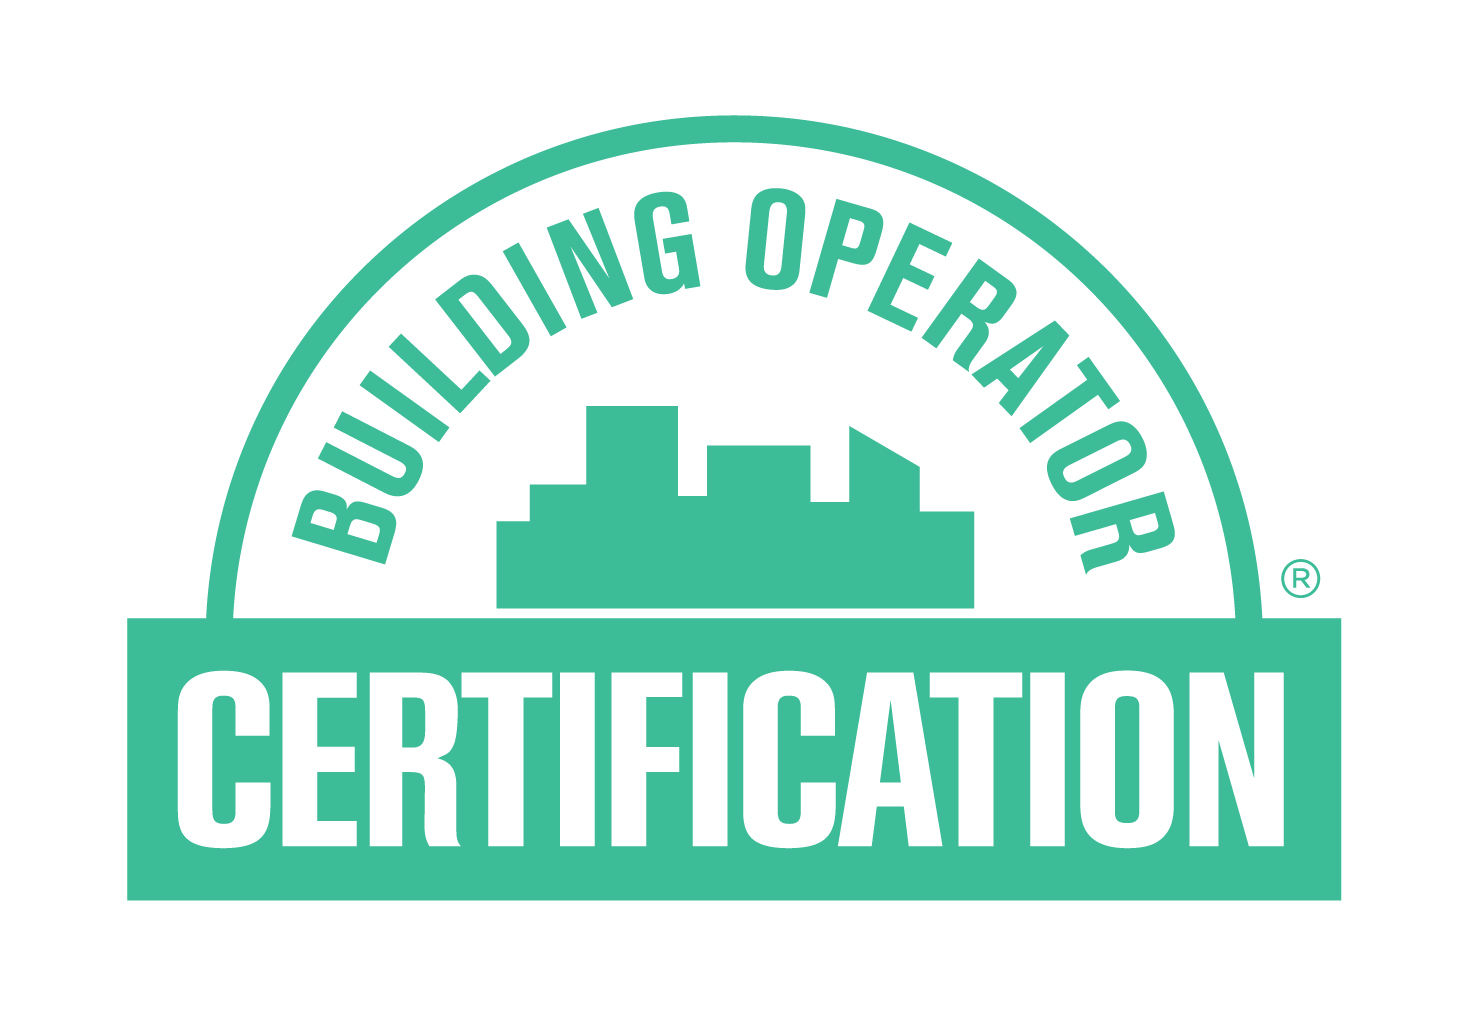 ciet building operator certification